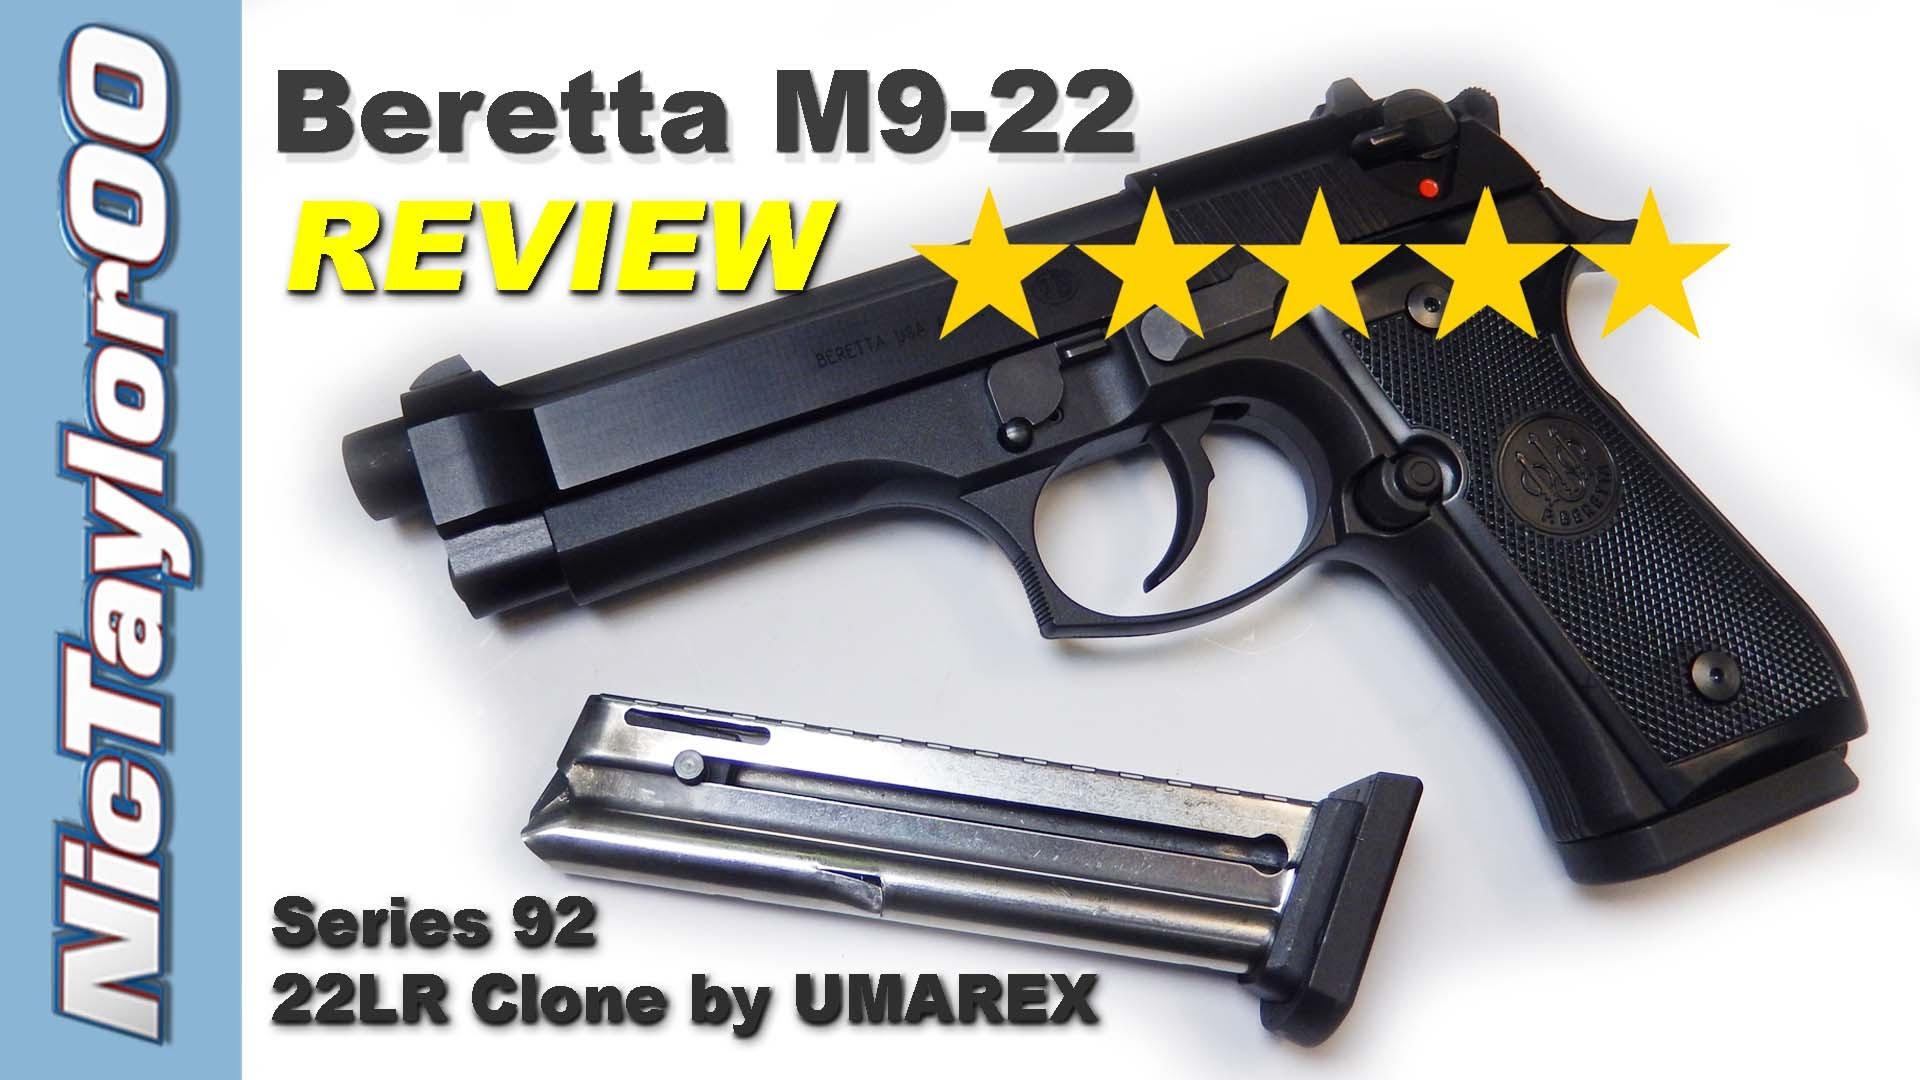 Beretta / Umarex M9 22LR Intial Review - 92 Series Pistol